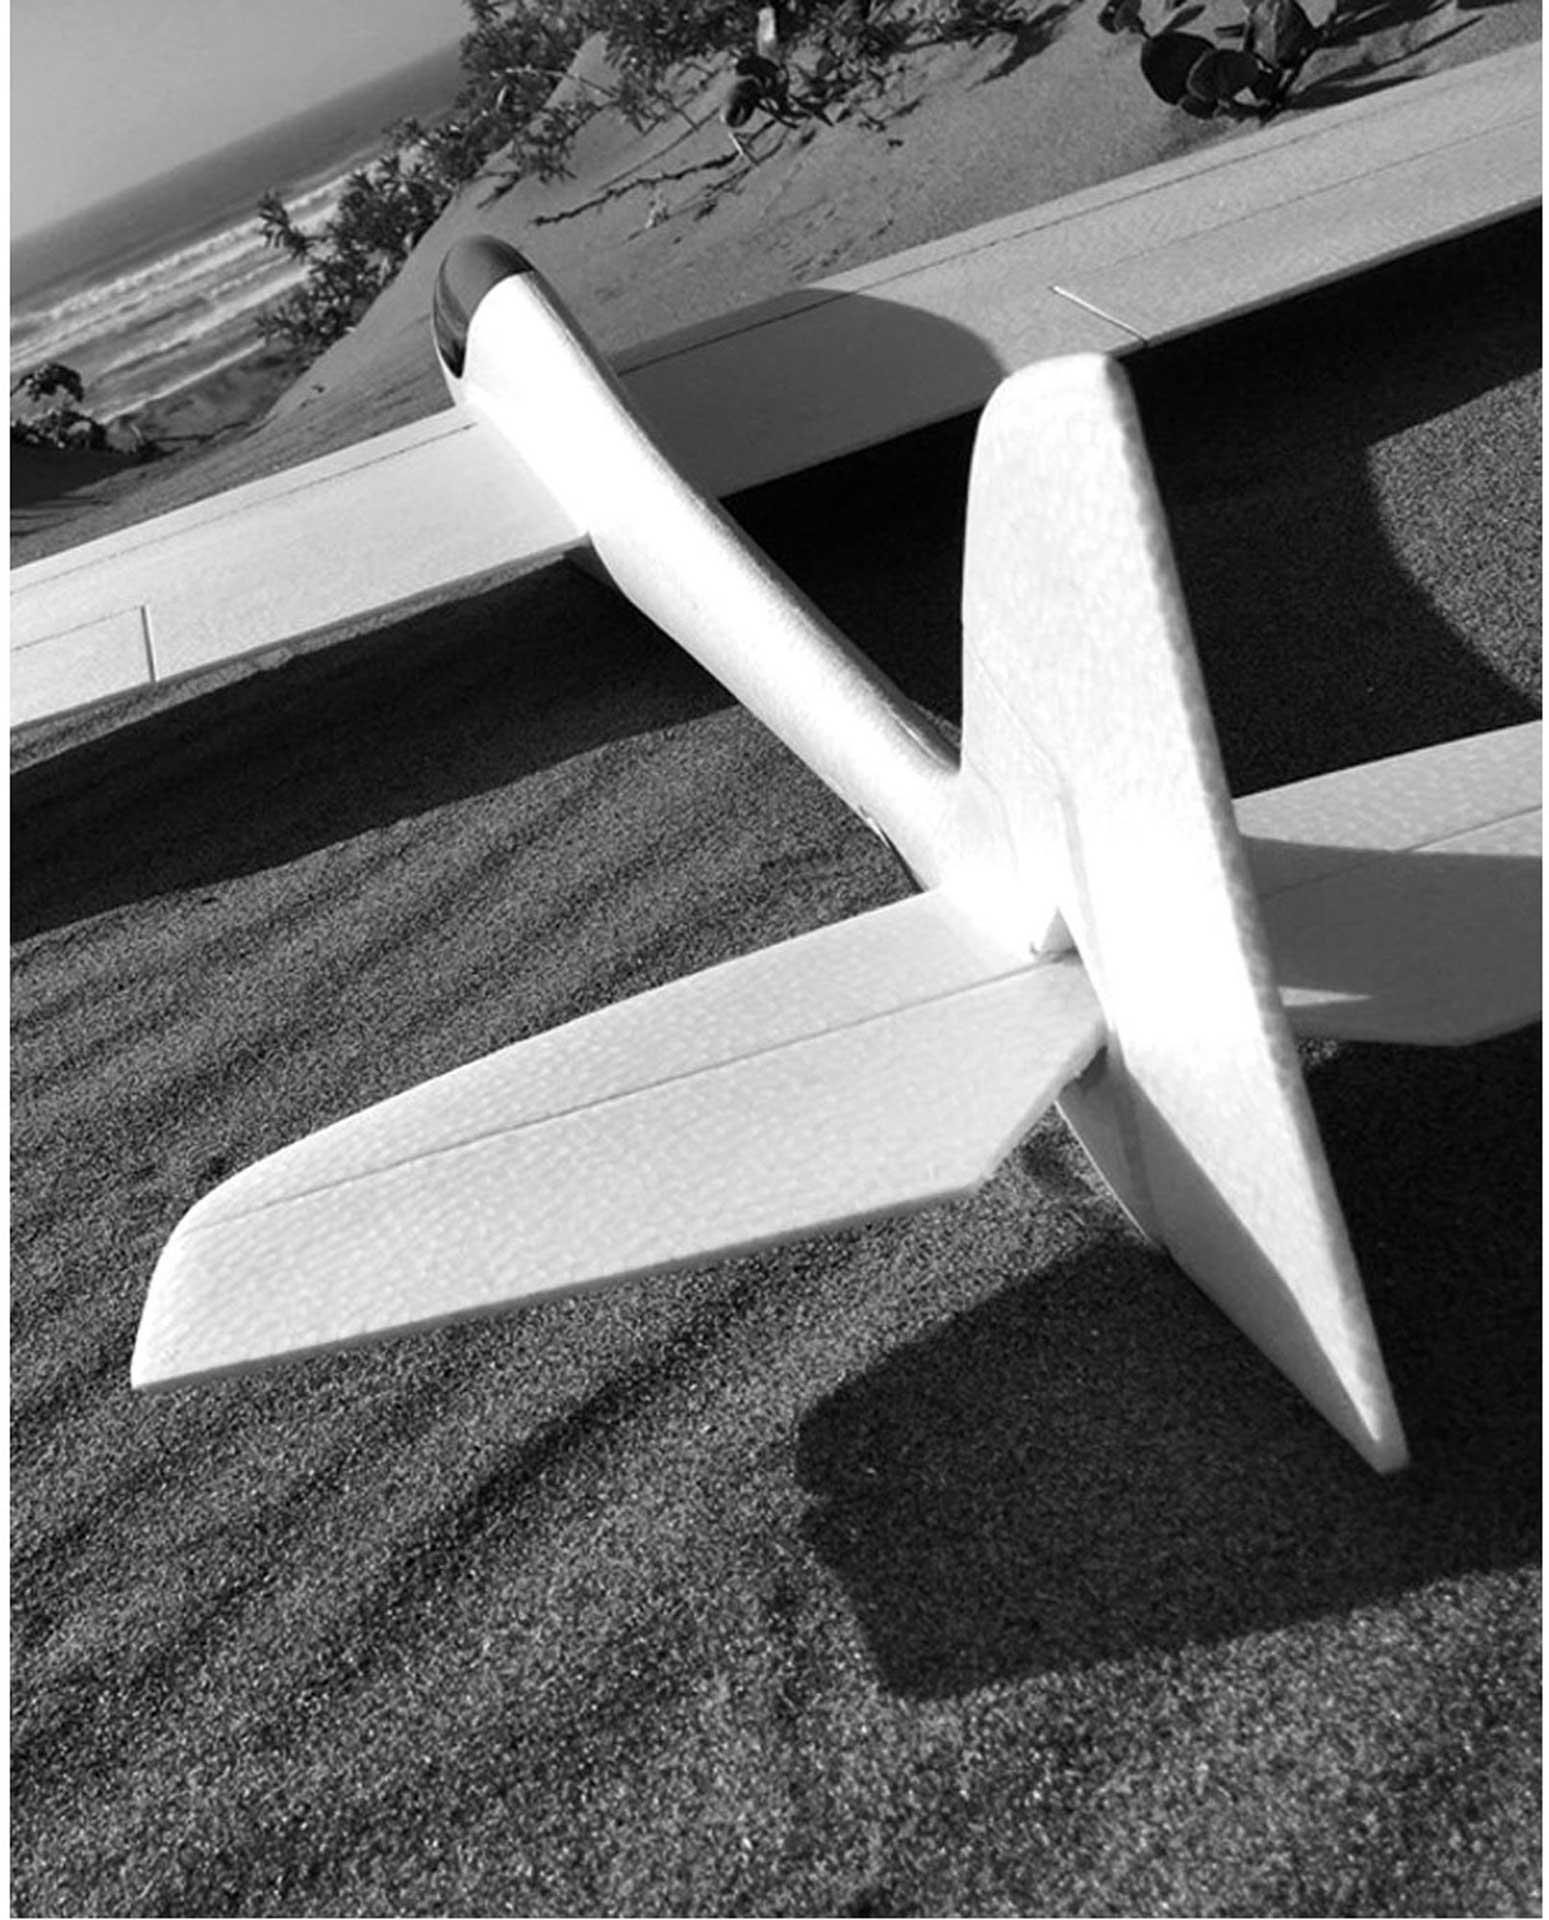 DREAM-FLIGHT AHI HANGFLUG / KUNSTFLUGMODELL AUS ROBUSTEM EPO FORMSCHAUM